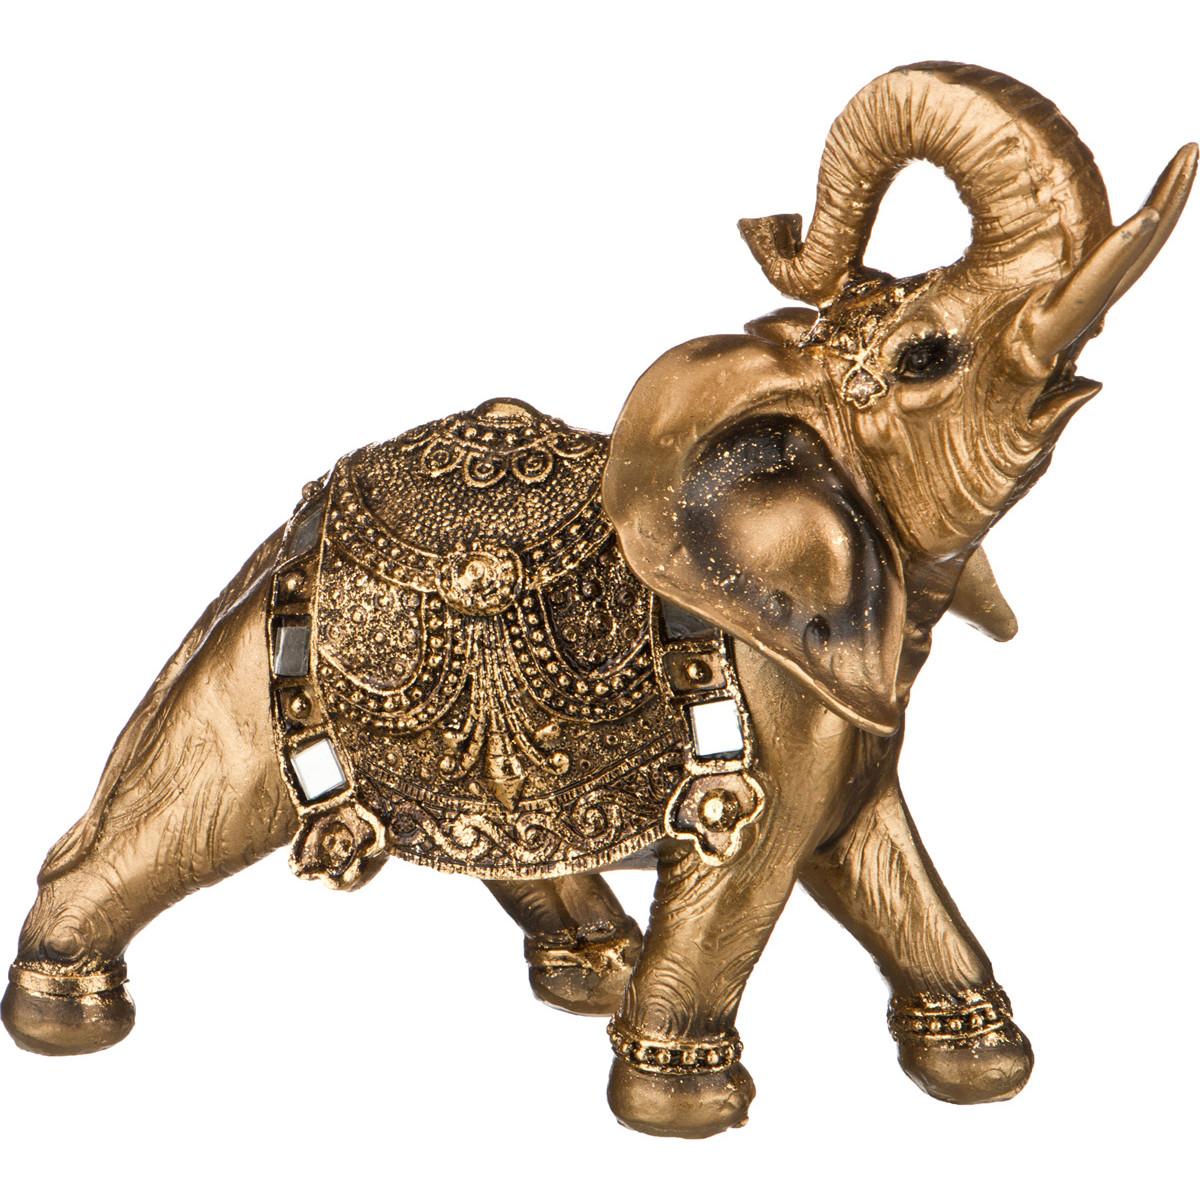 {} Lefard Фигурка Слон (9х19х20 см) фигурка декор 19 5 9 5 20 5 см слон красный 1132662